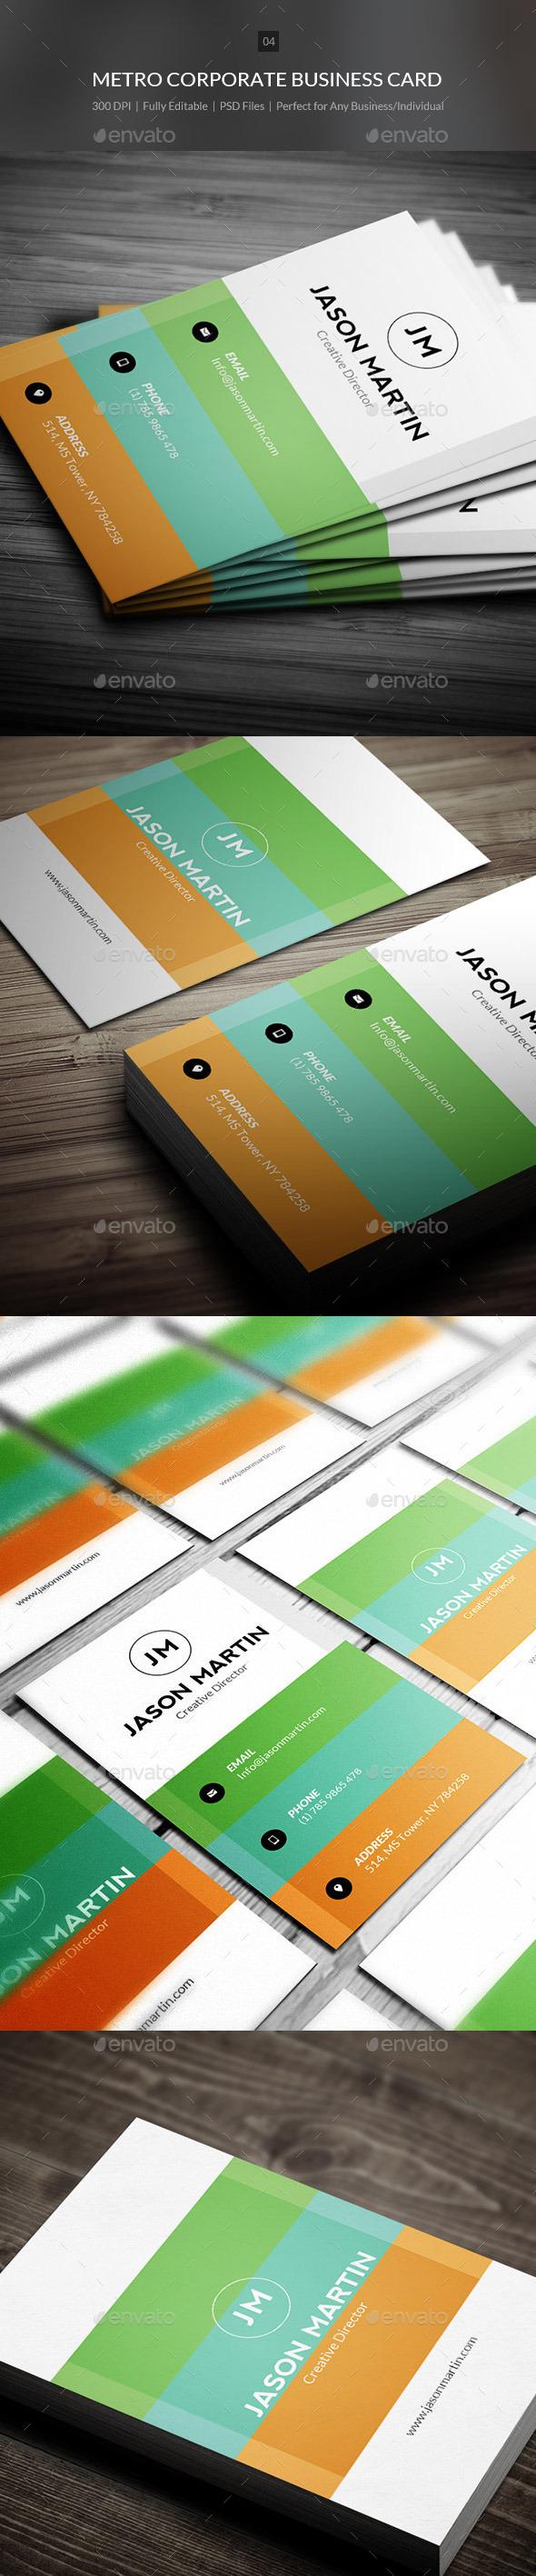 Metro Corporate business Card - 04 - Corporate Business Cards